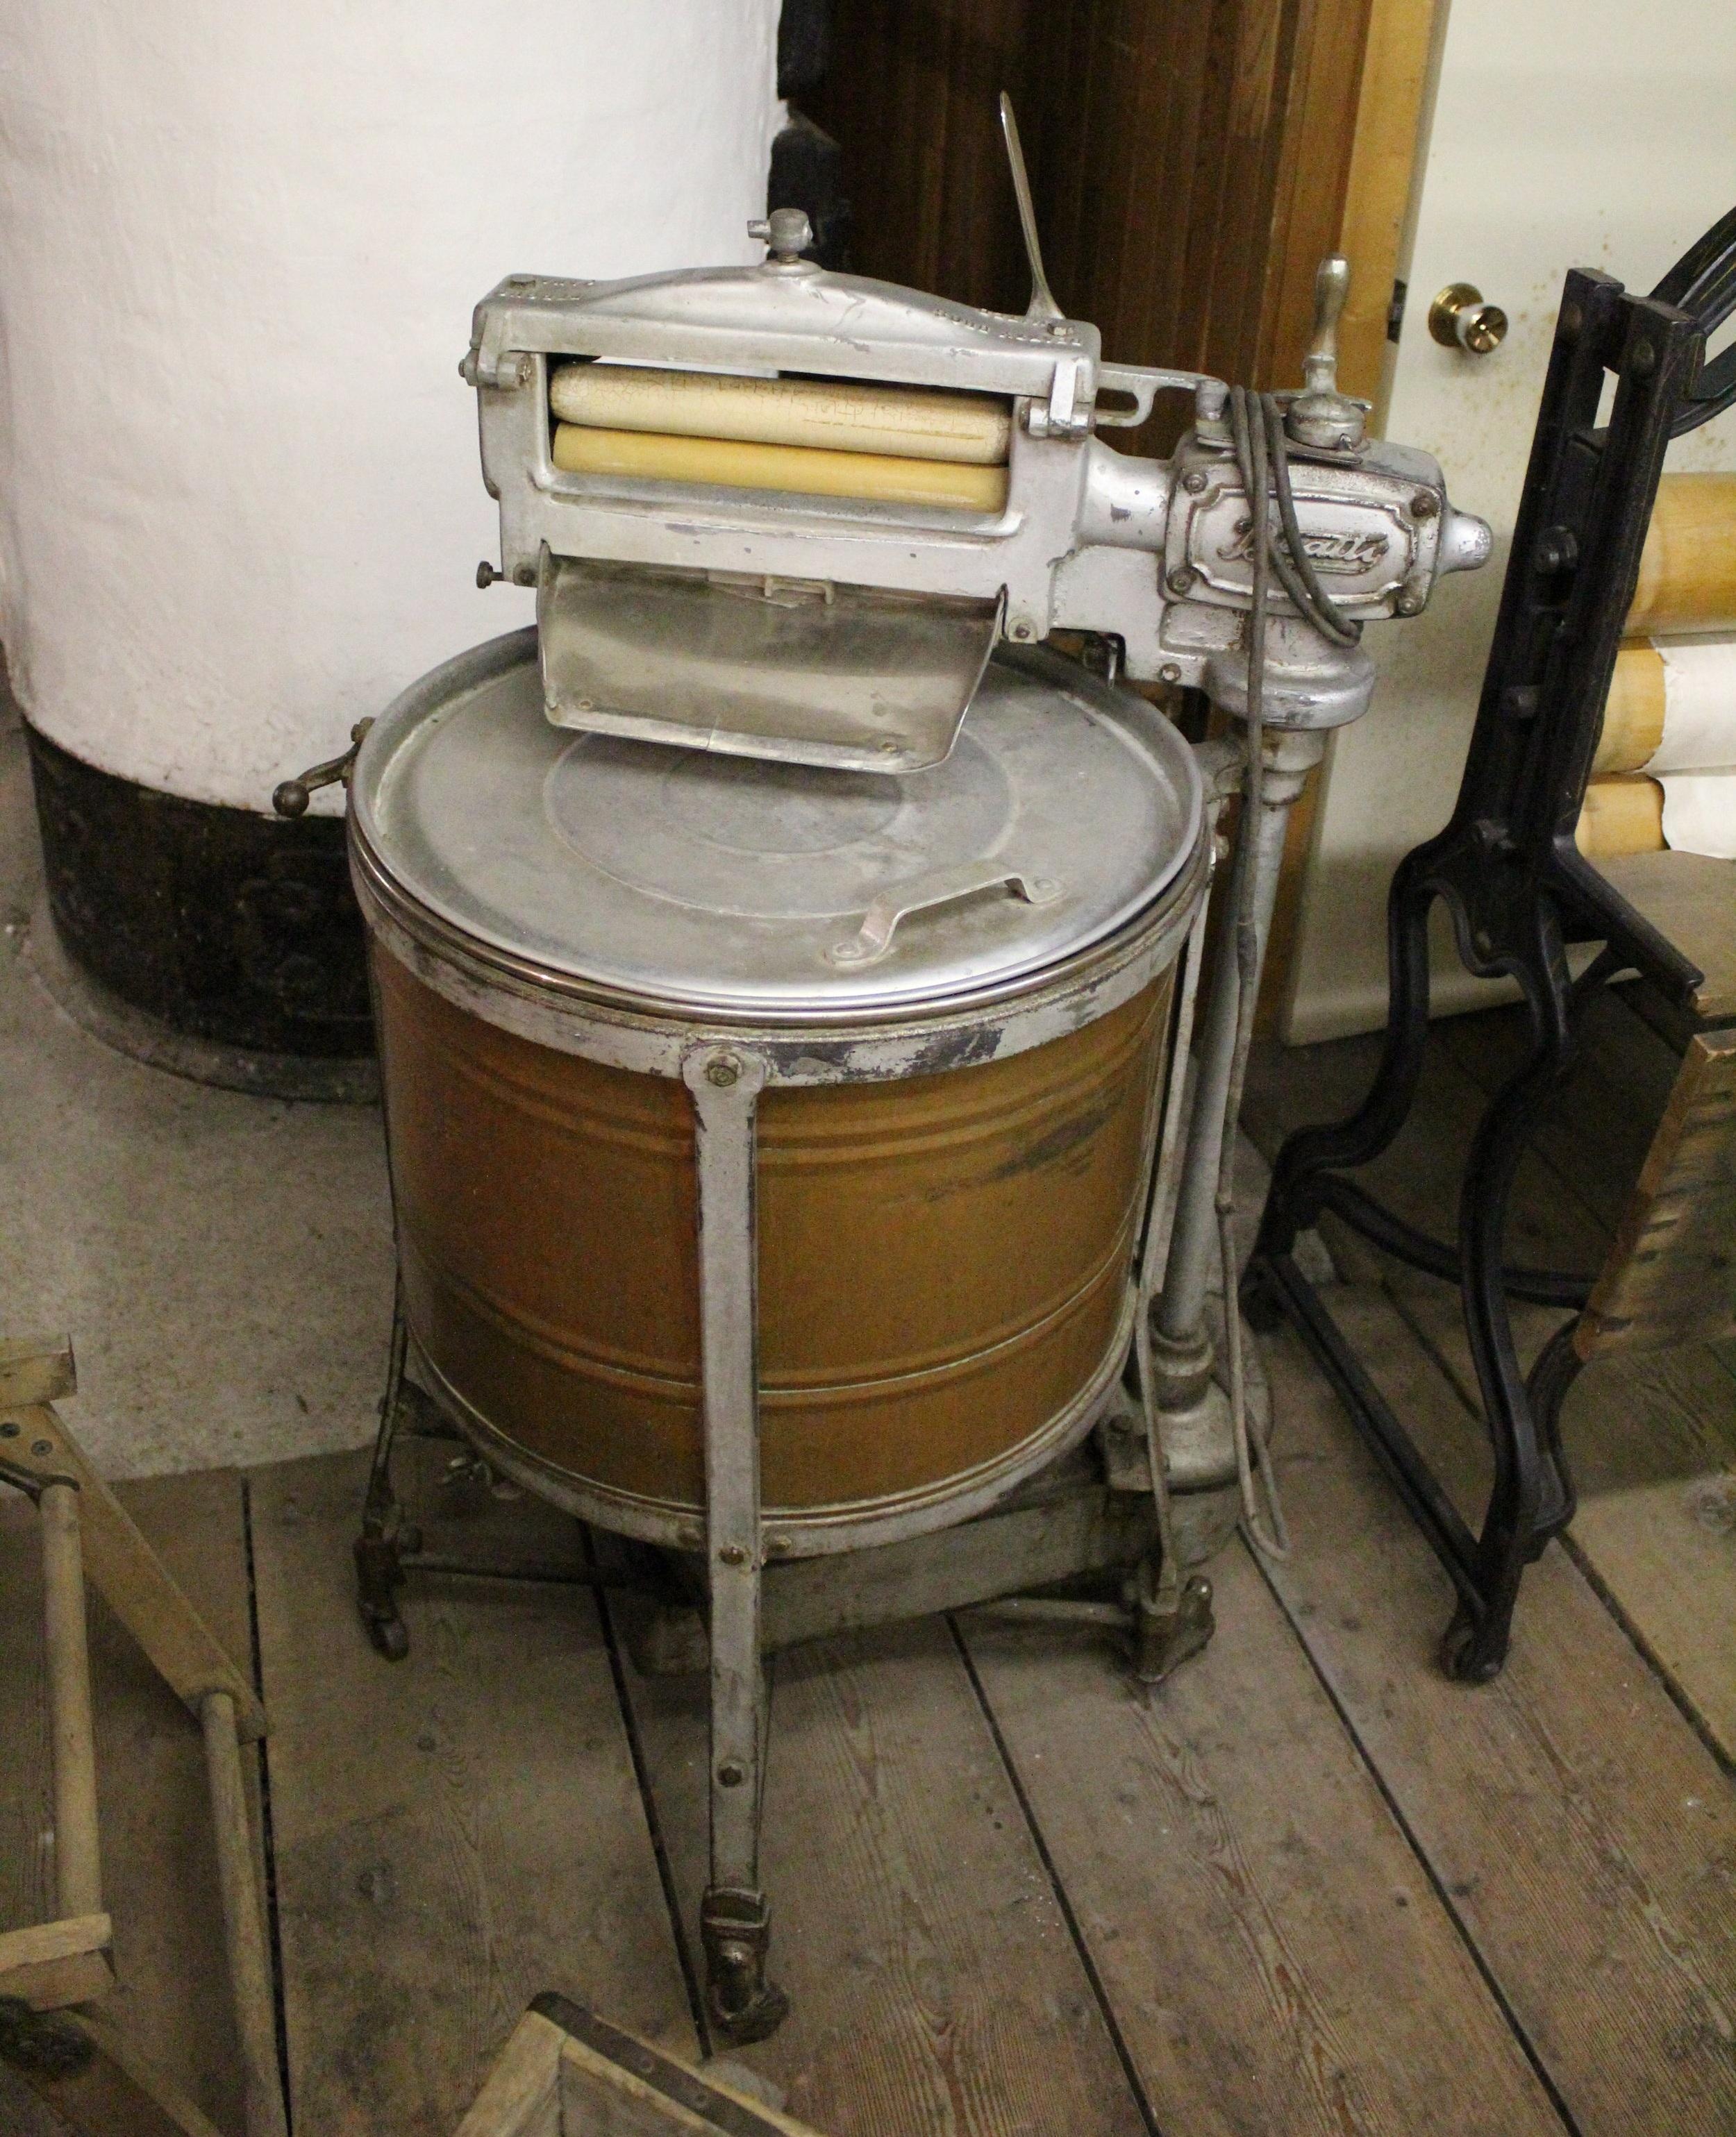 Electric Beattie washing machine, Dalnavert Museum